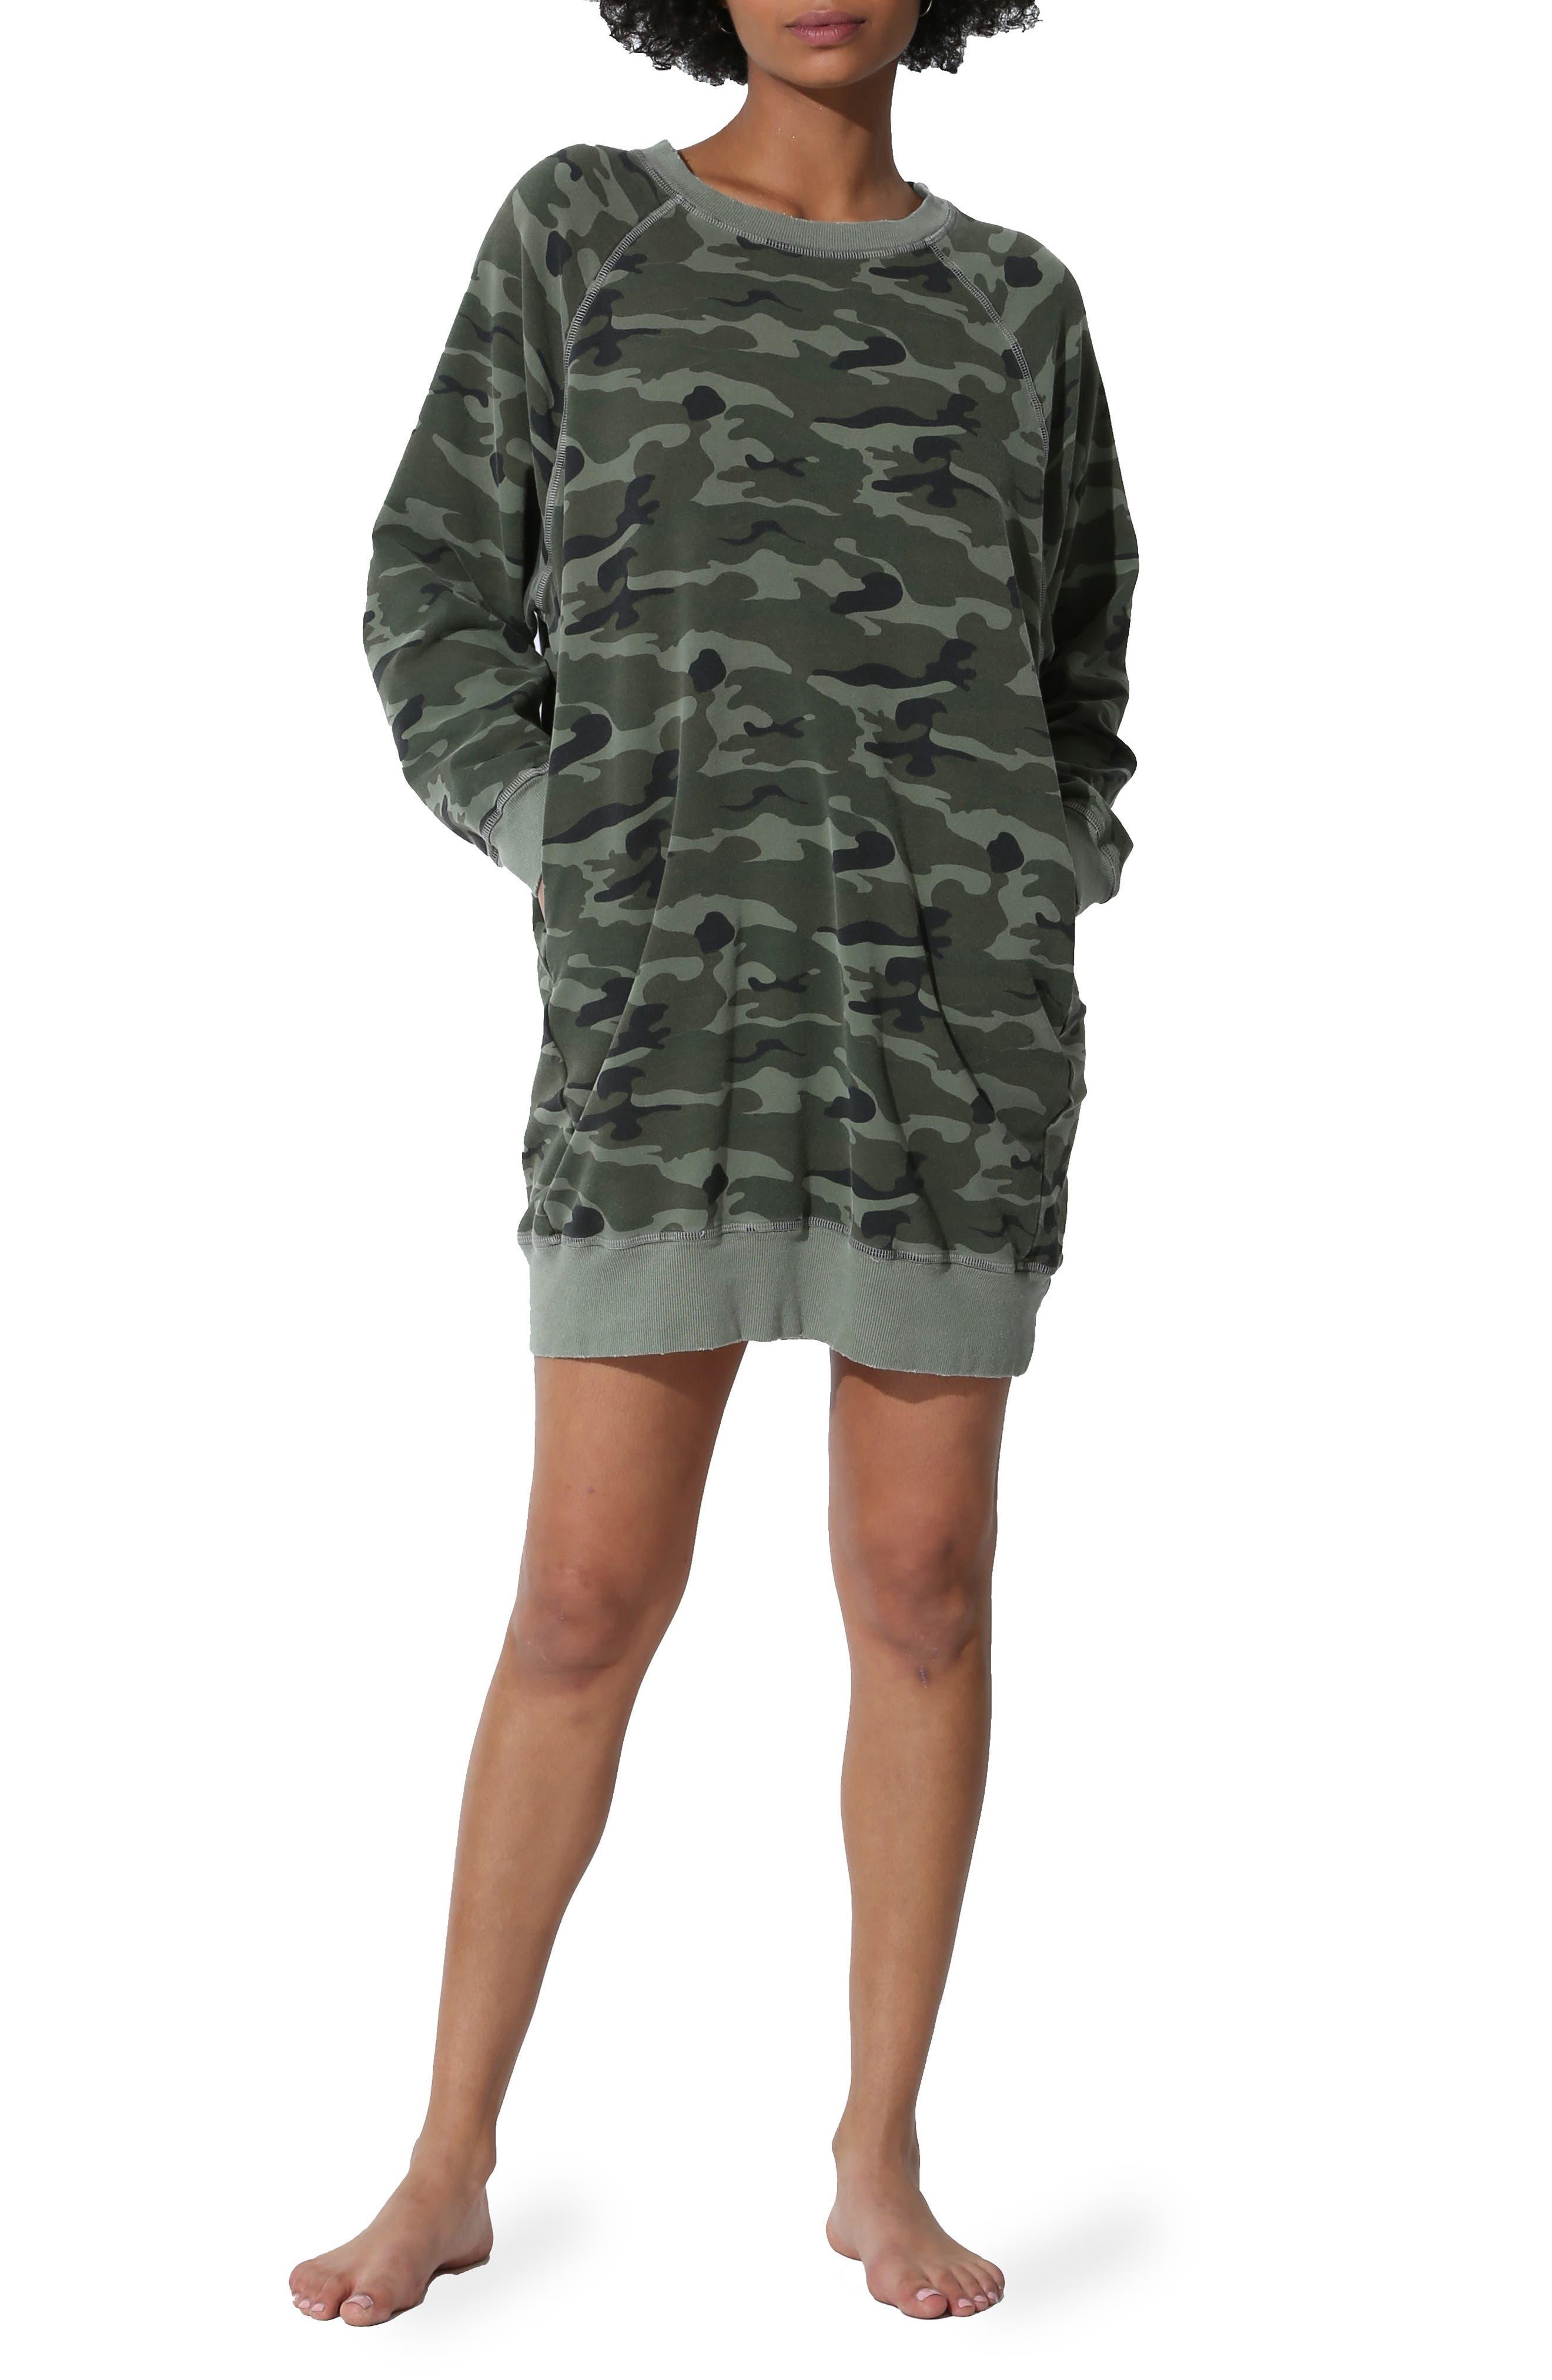 Sunday Camo Sweatshirt Dress